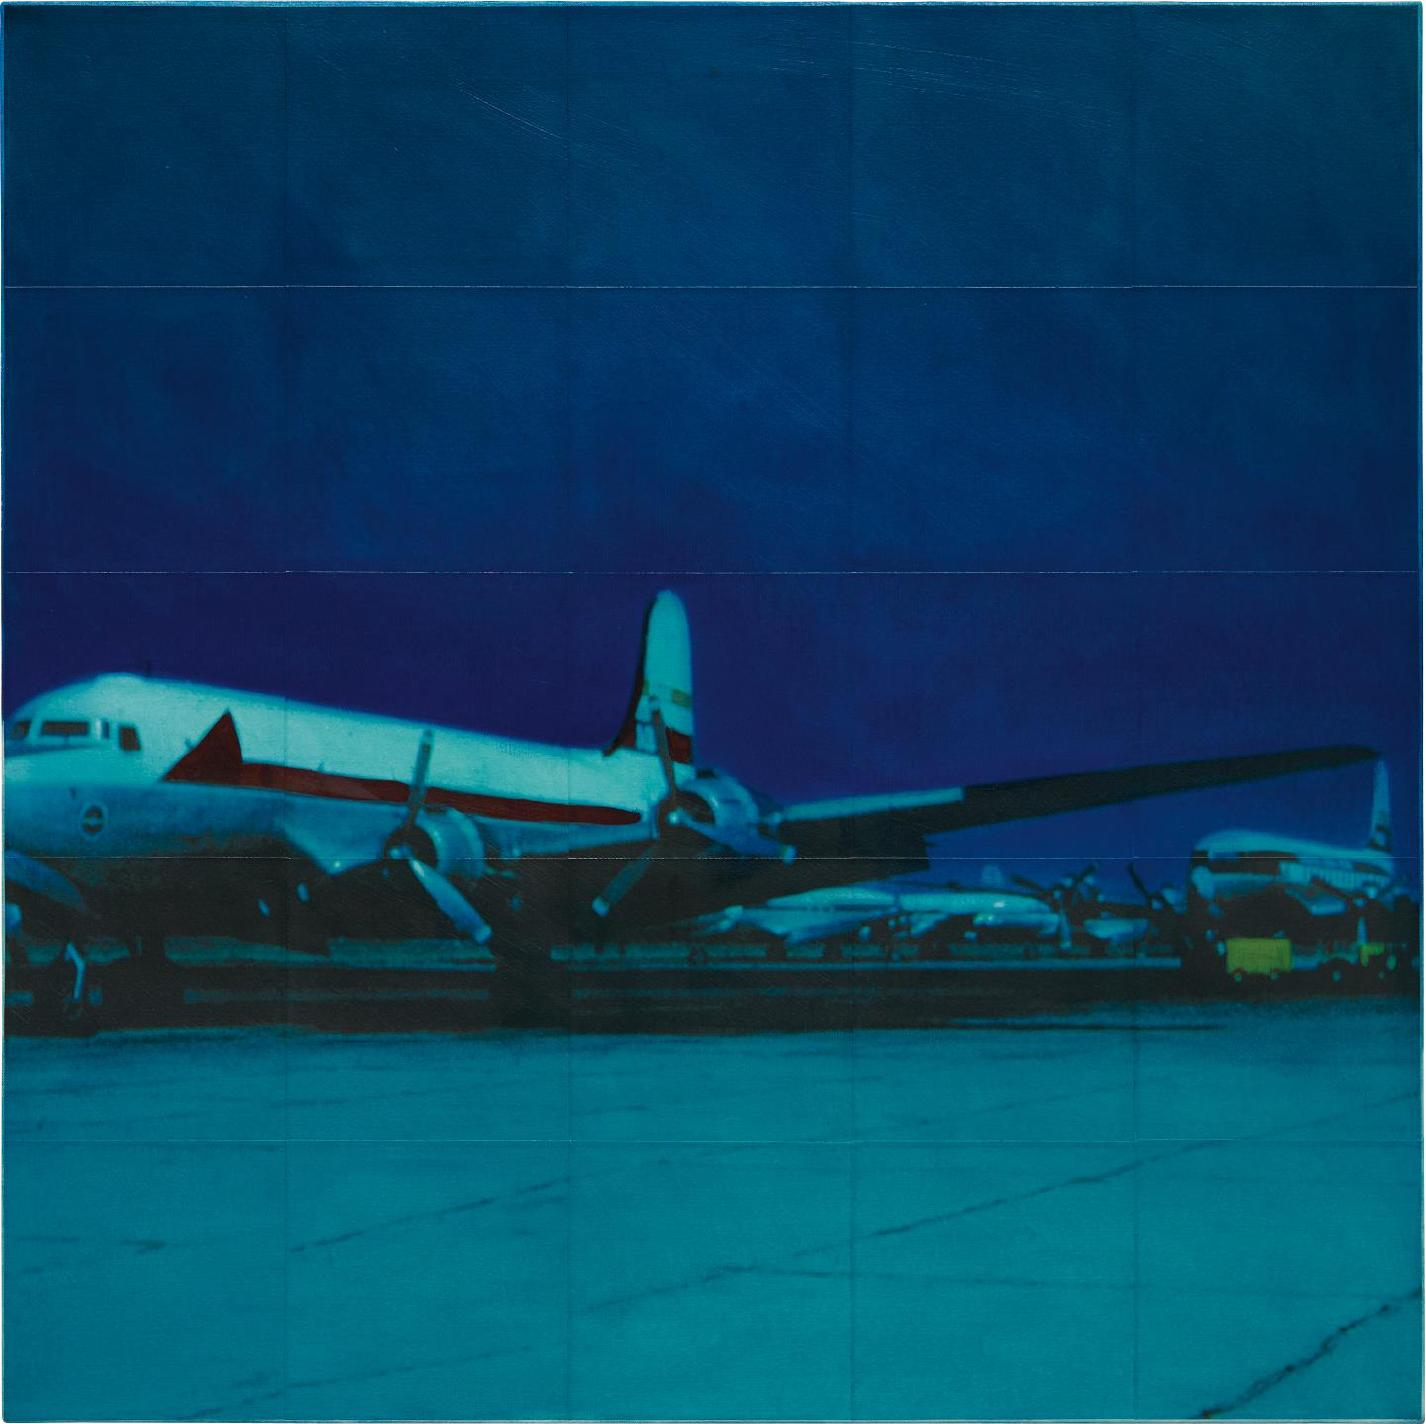 Isca Greenfield-Sanders-Blue Plane-2002